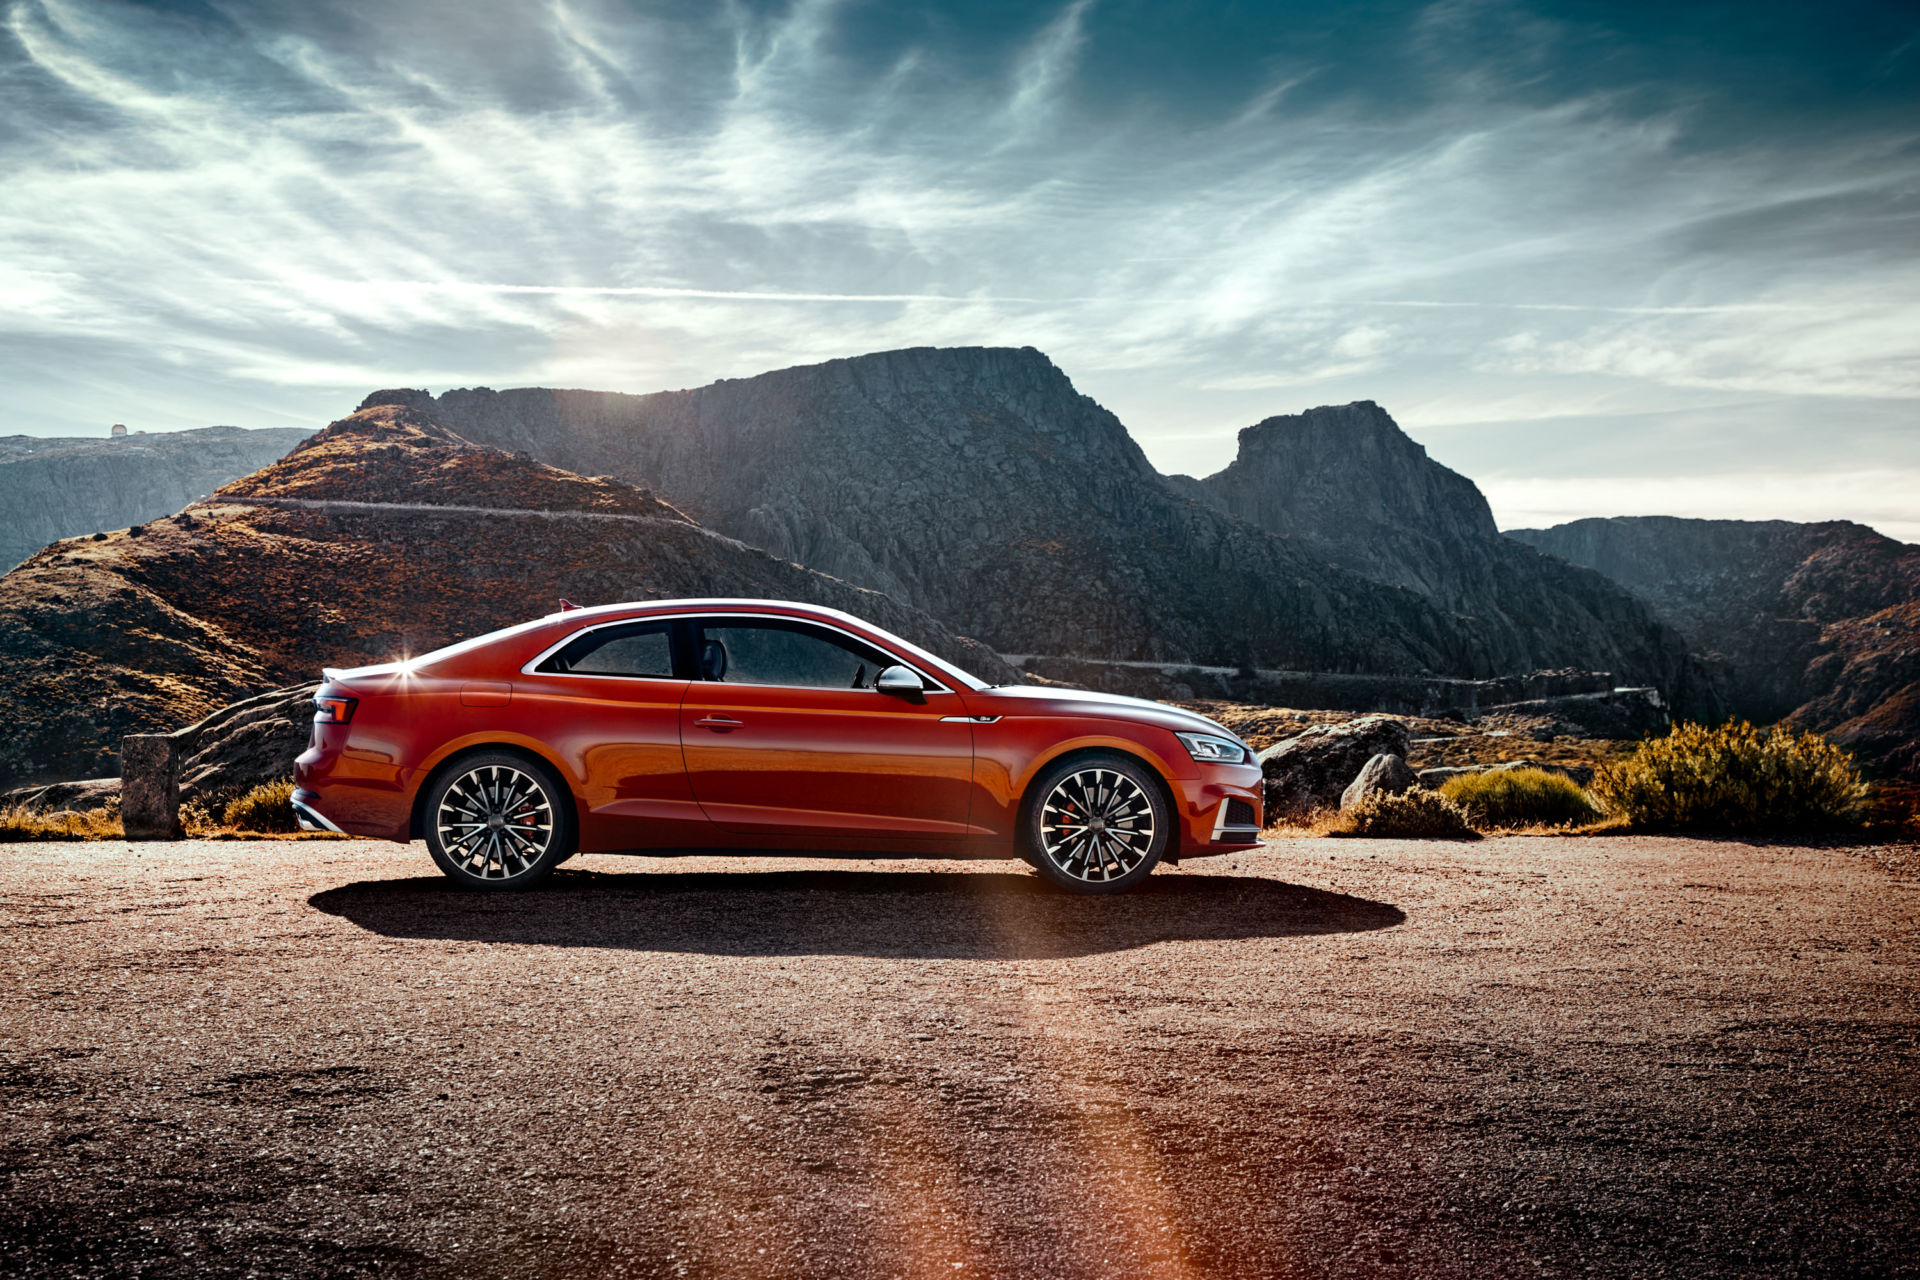 bernstein photodesign Audi S5